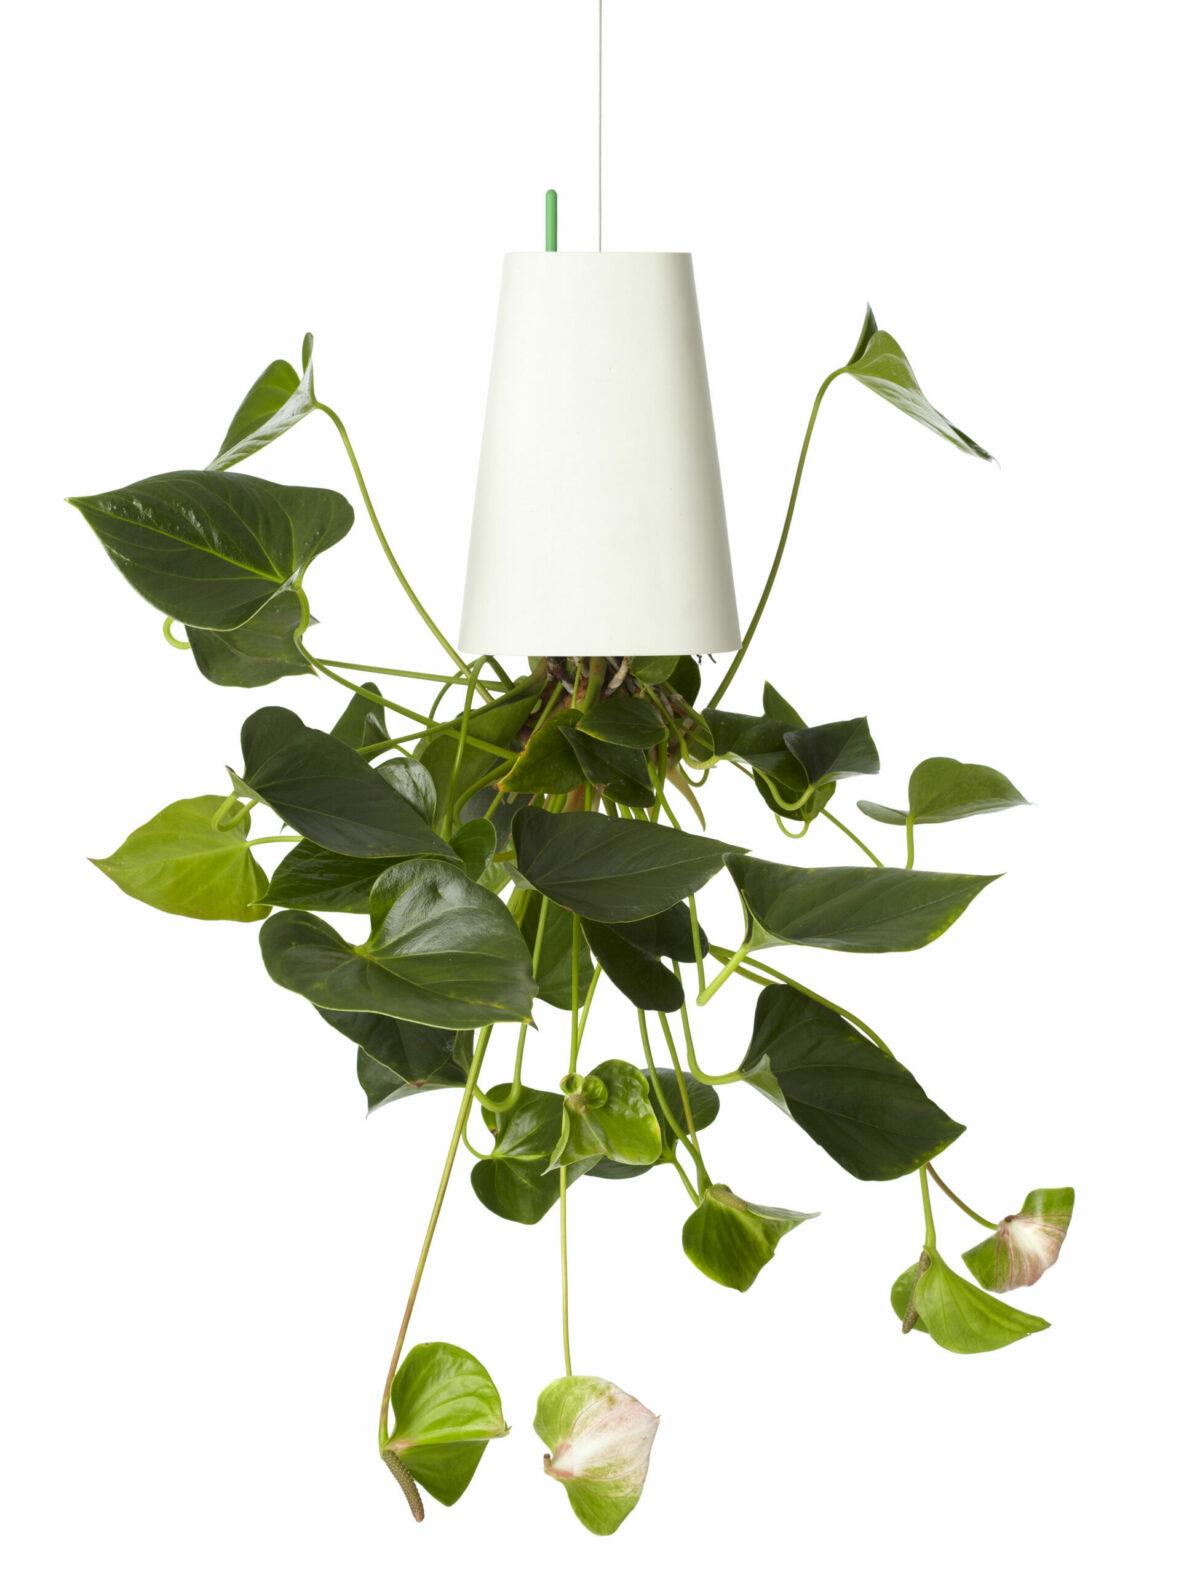 jardinière suspendue tombe plafond illusion déco green plante